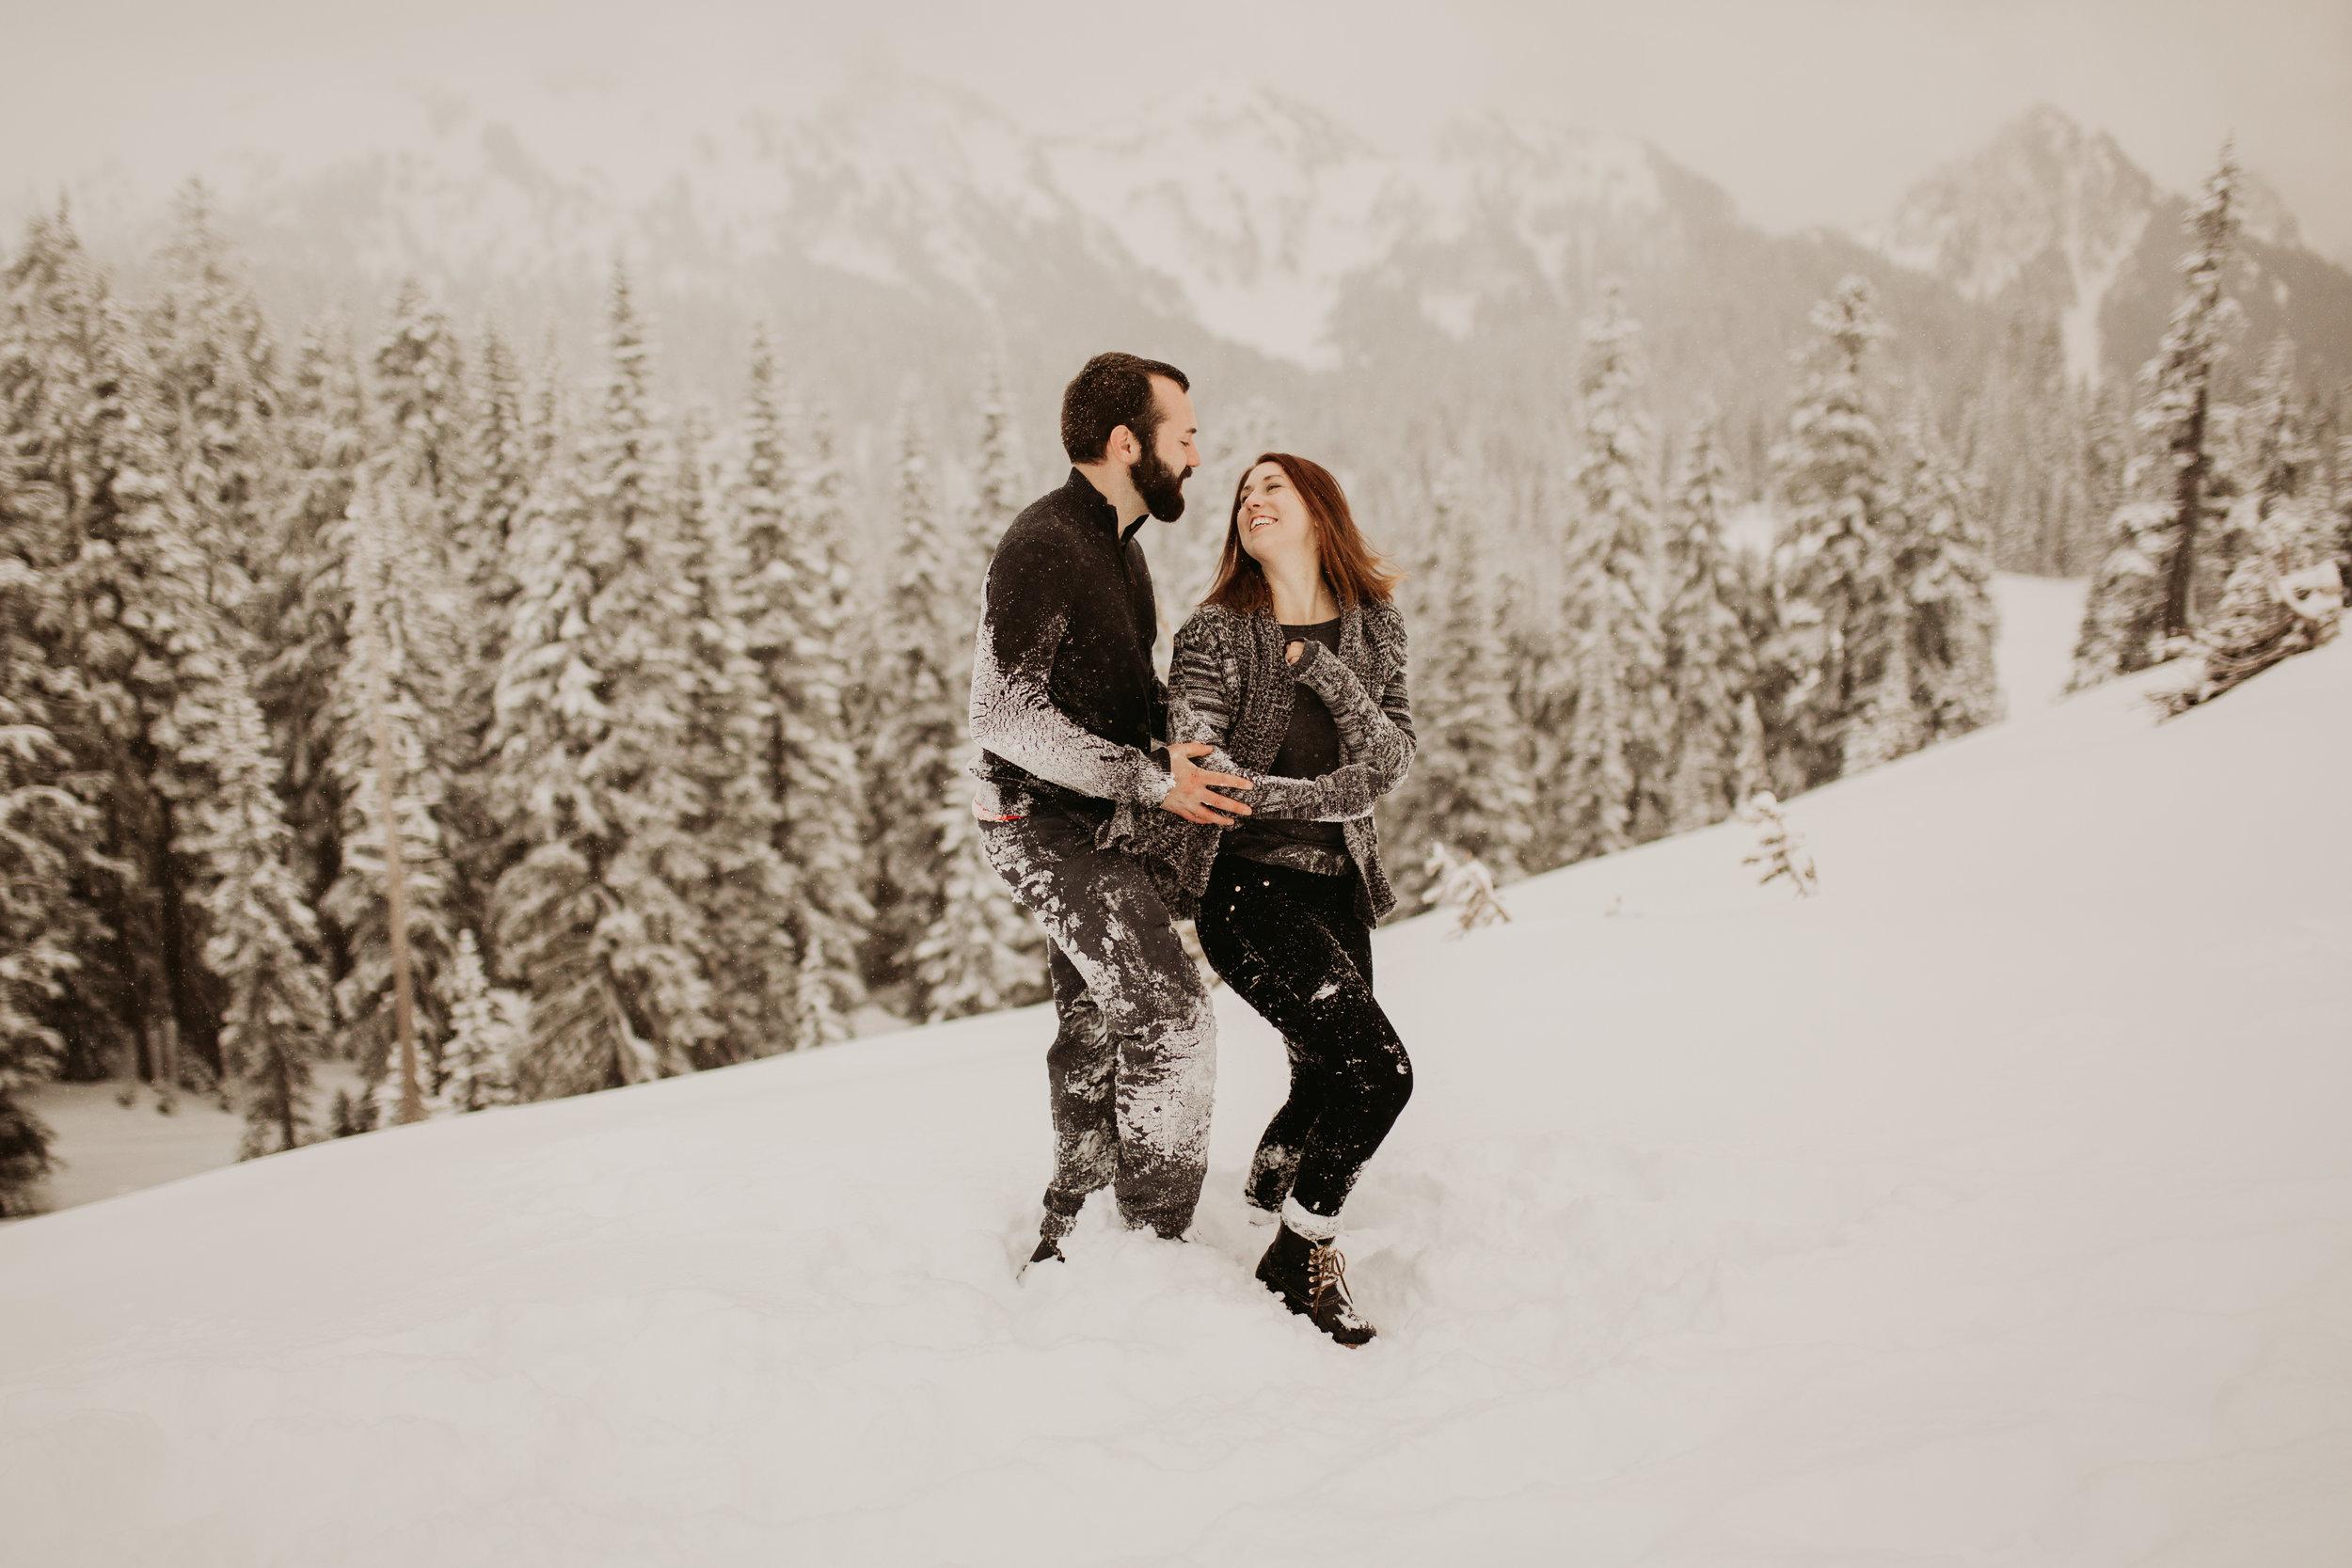 pnw_washington_oregon_elopement_mount_rainer_engagement_wedding_photographer11.jpg